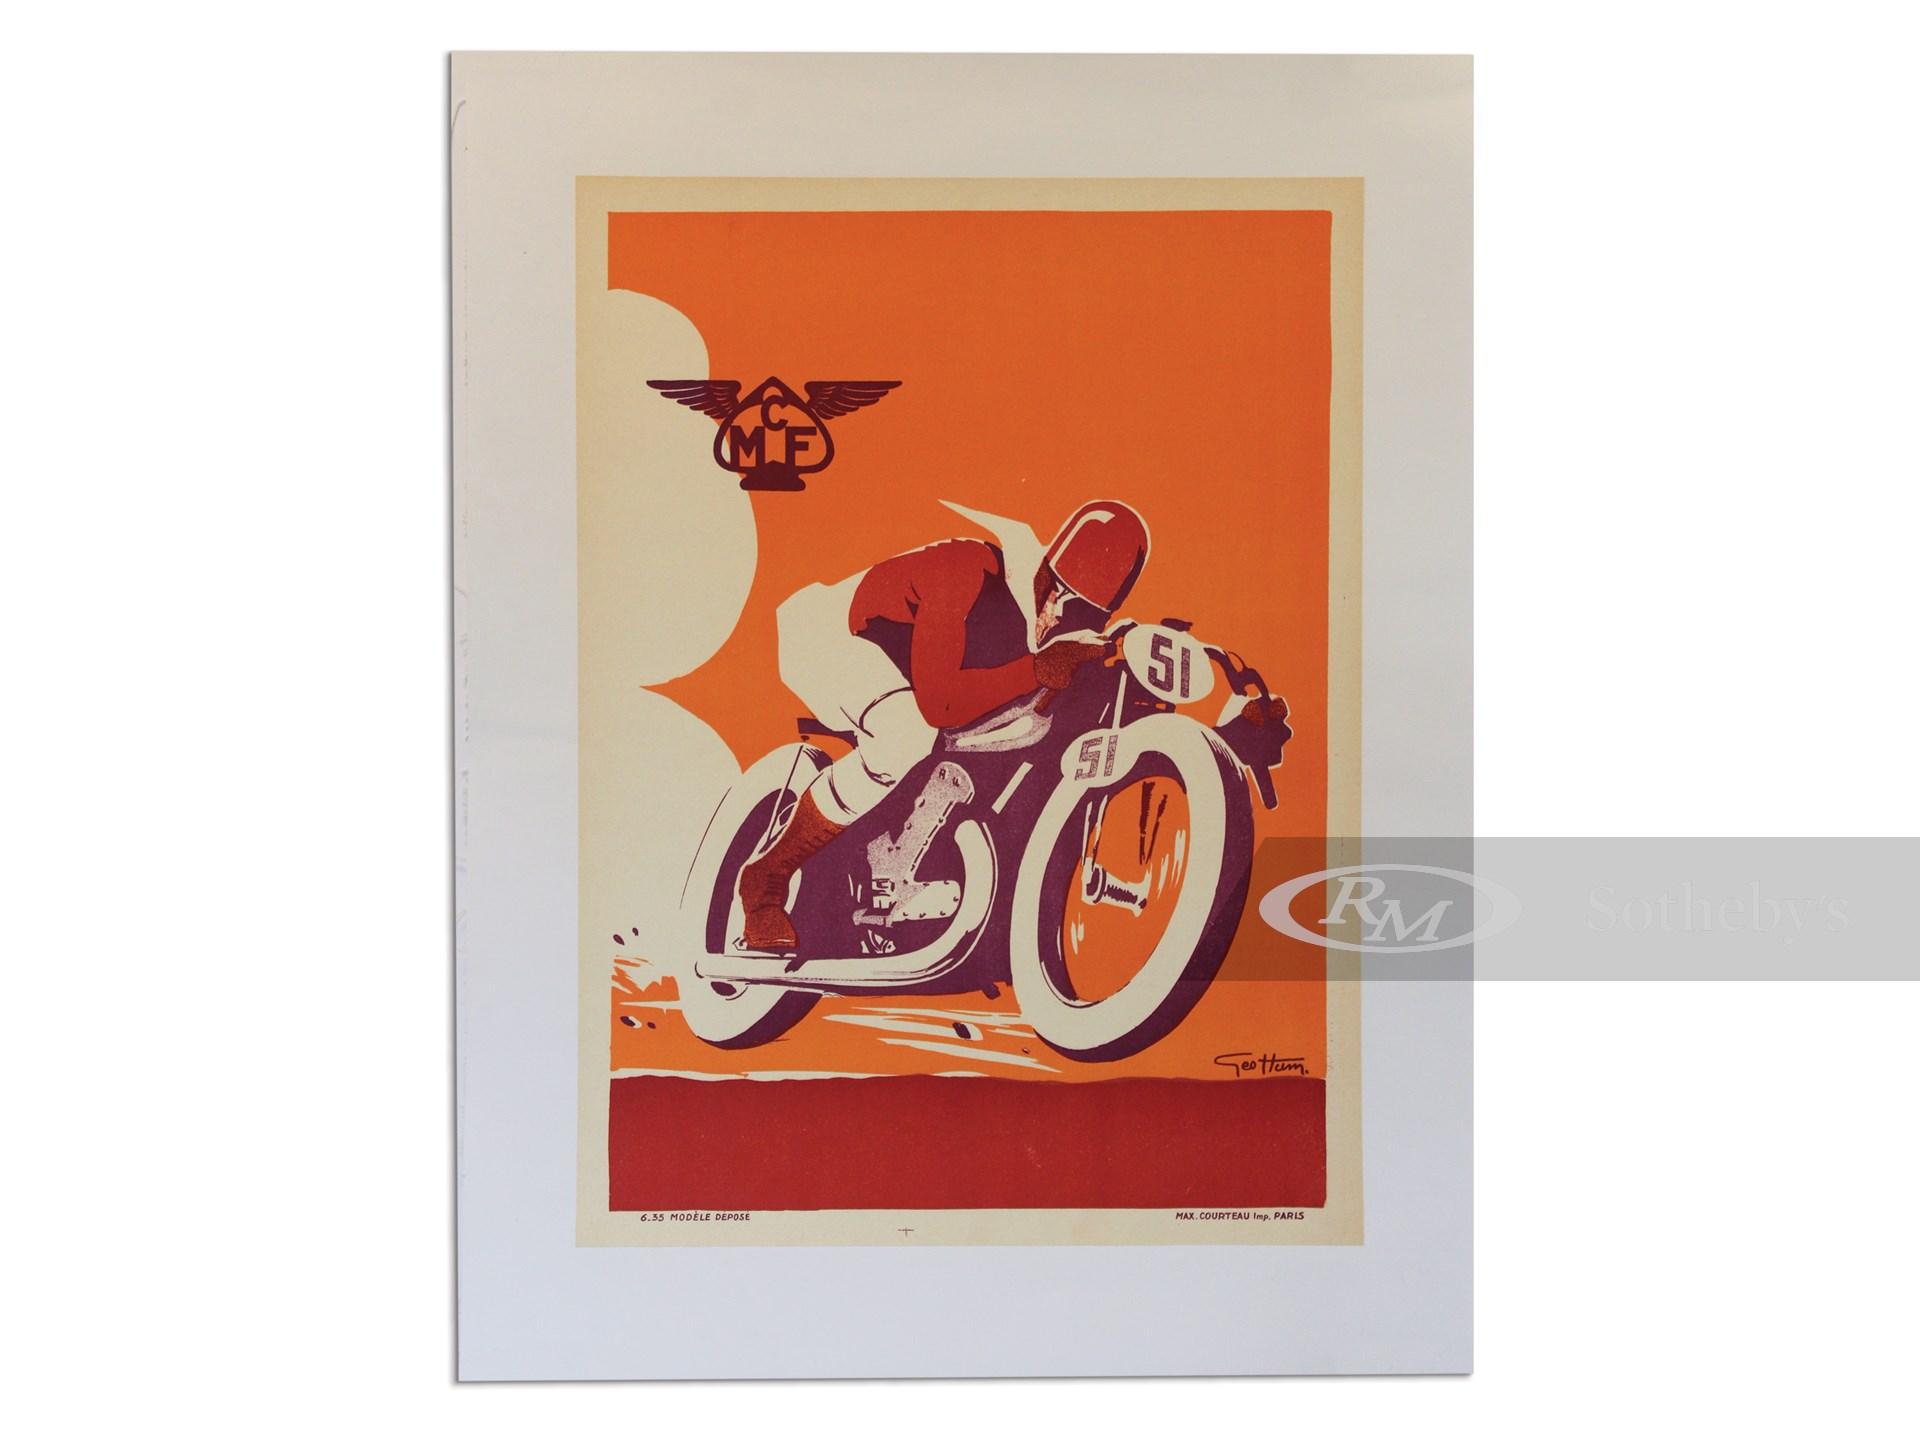 MCF Moto Club of France, 1935 -